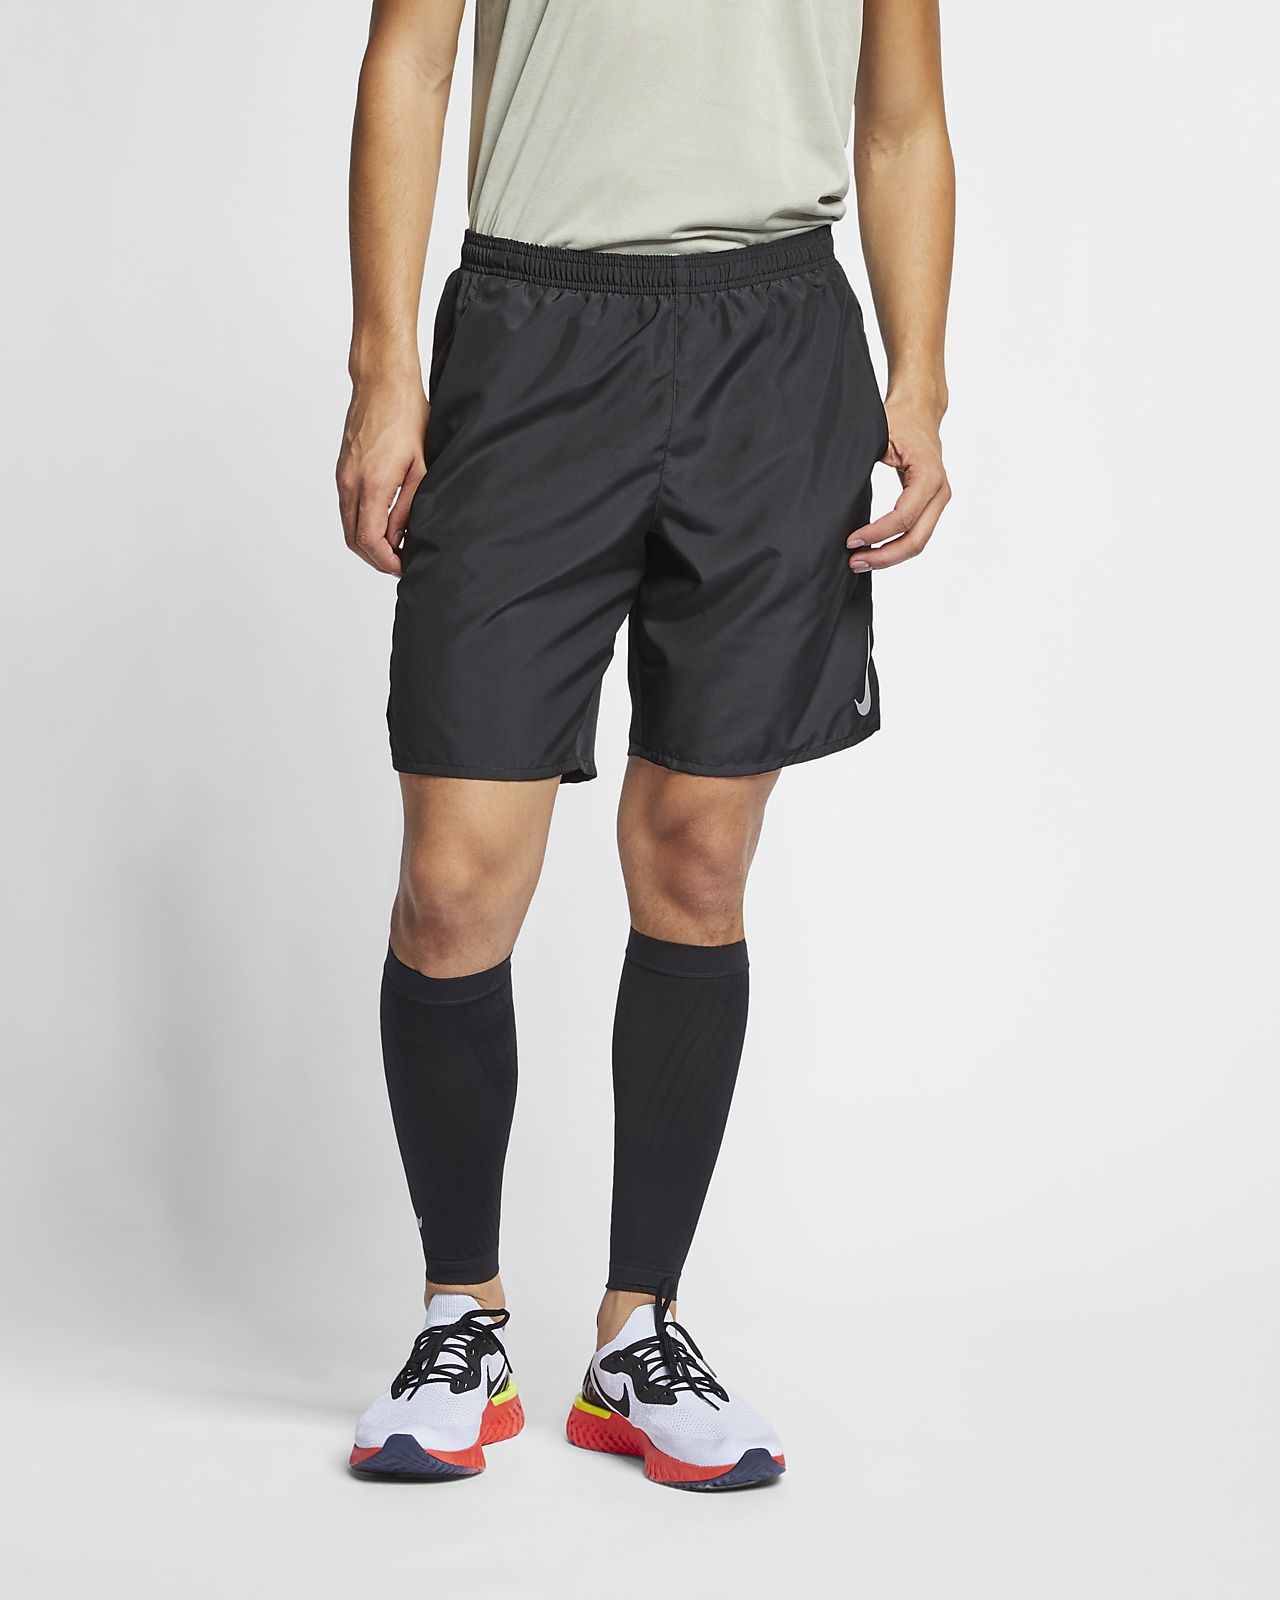 Nike Challenger Herren-Laufshorts